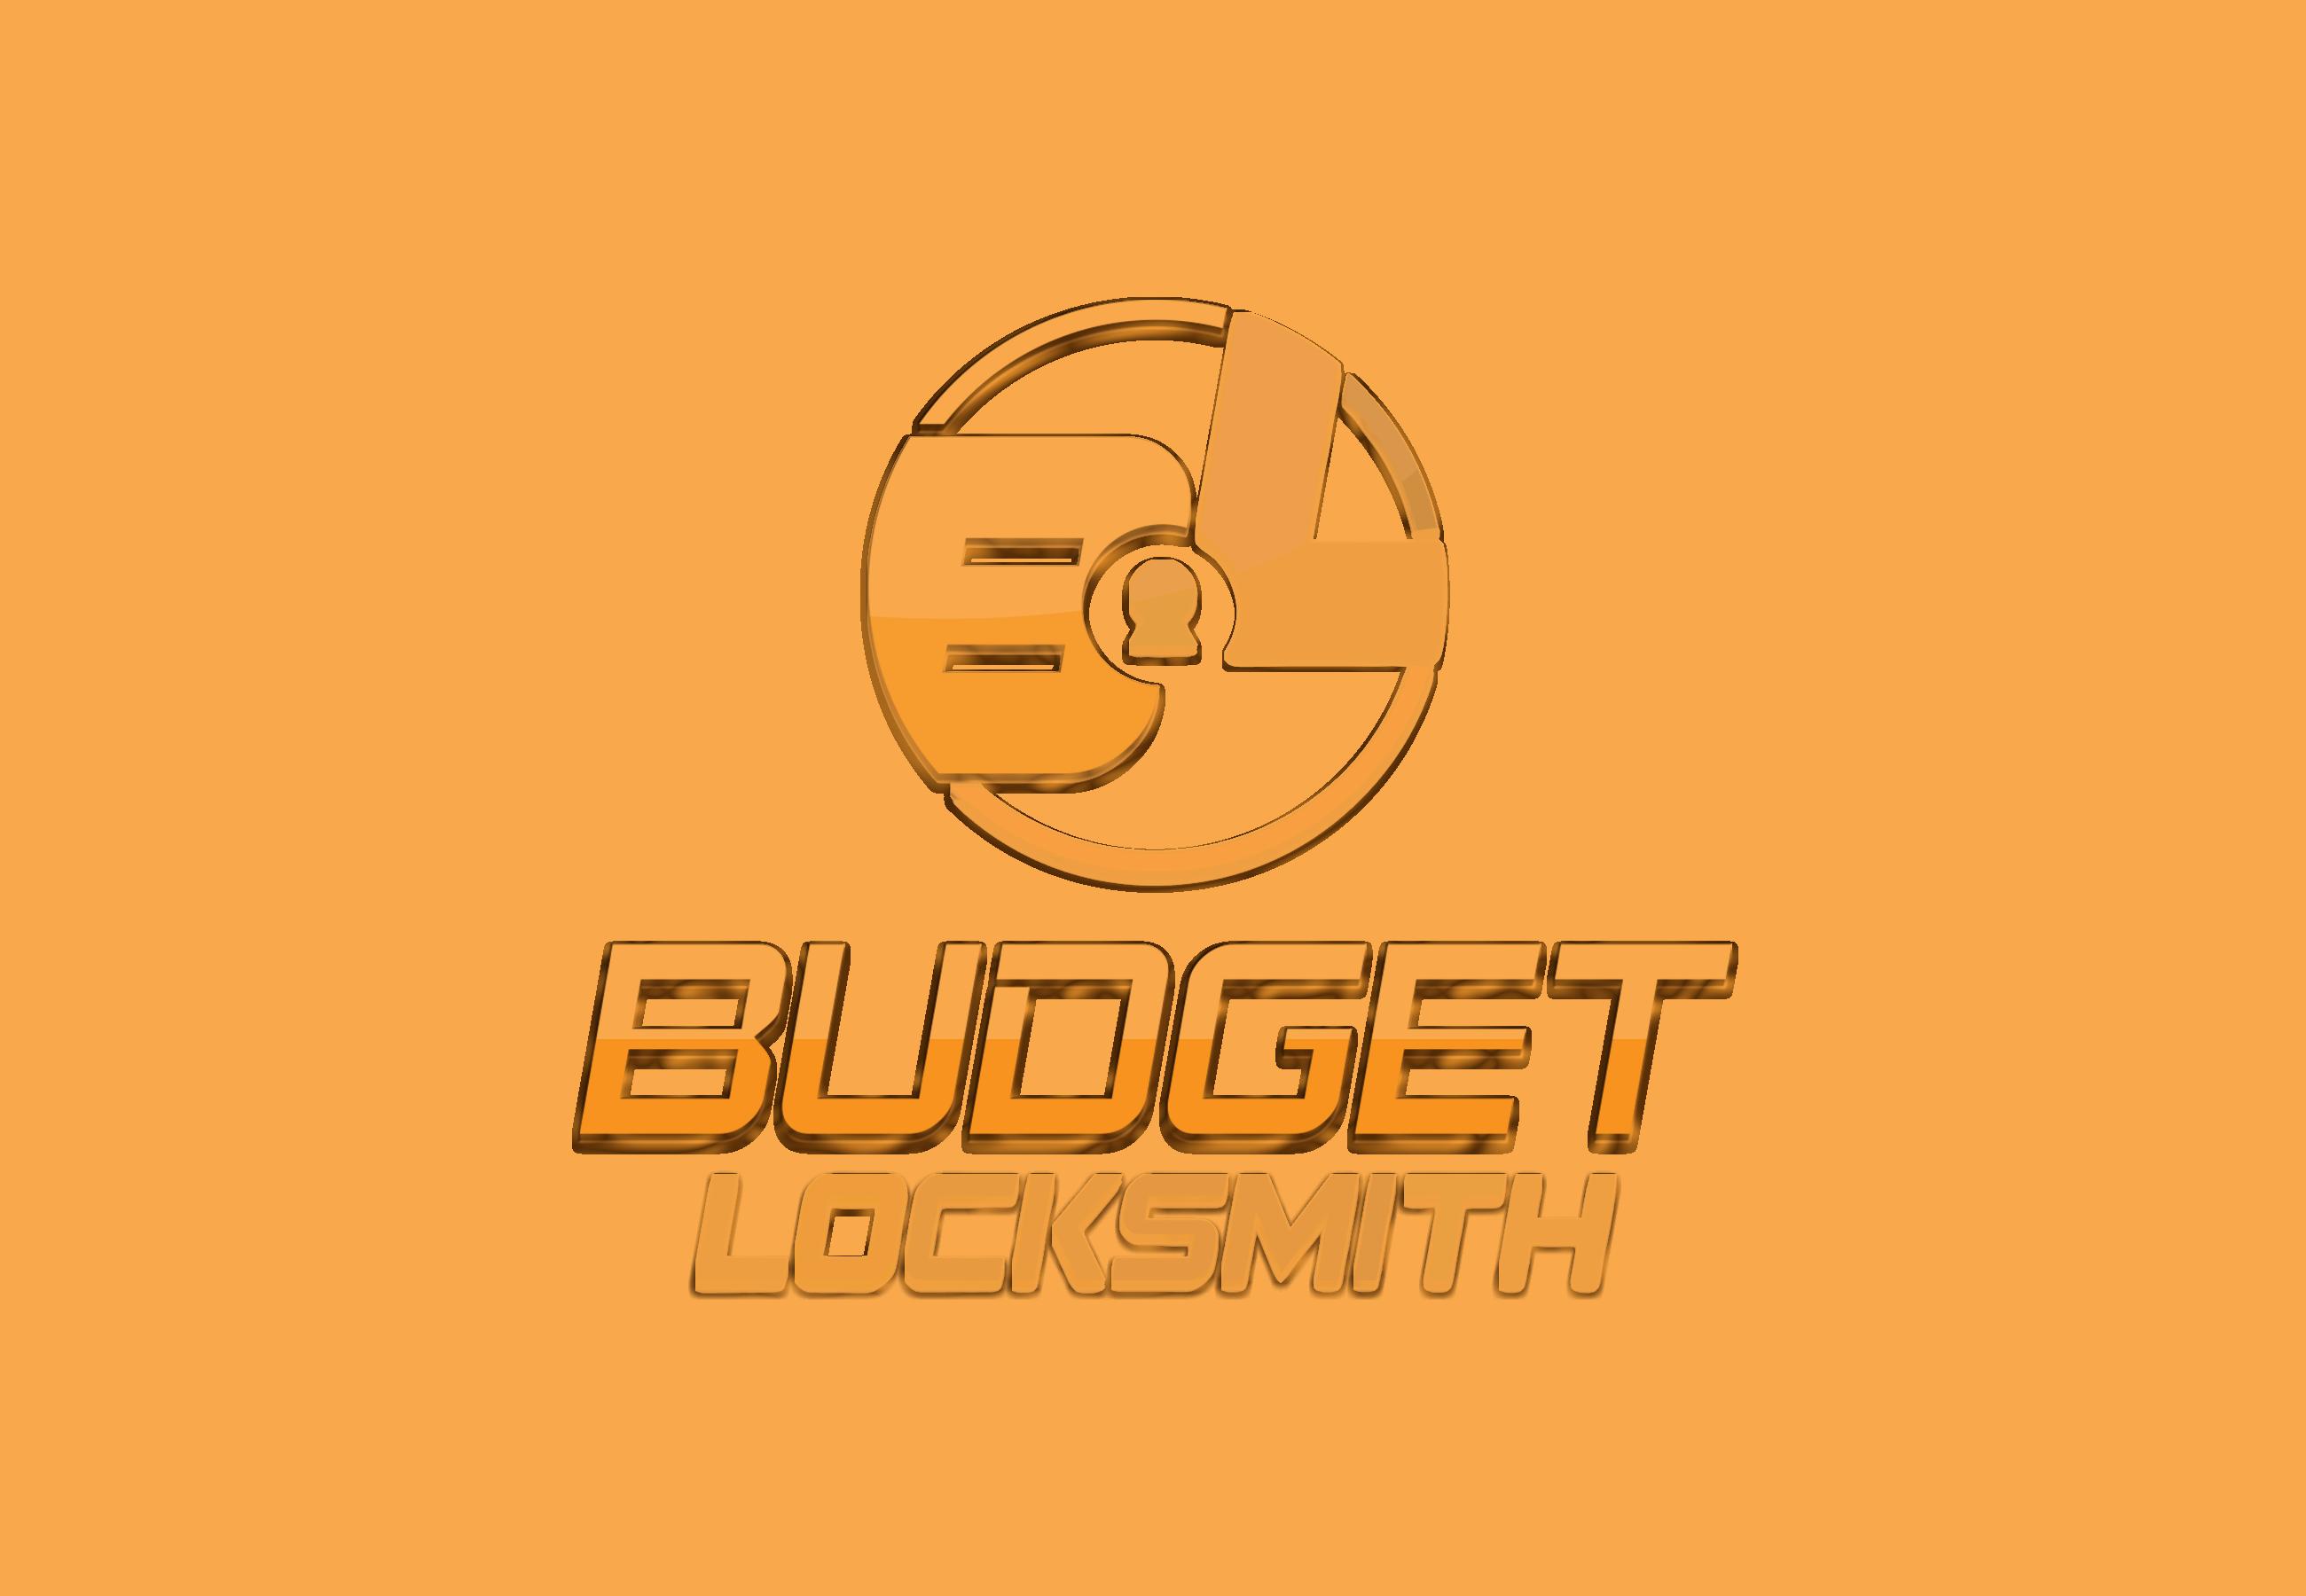 Budget Locksmith